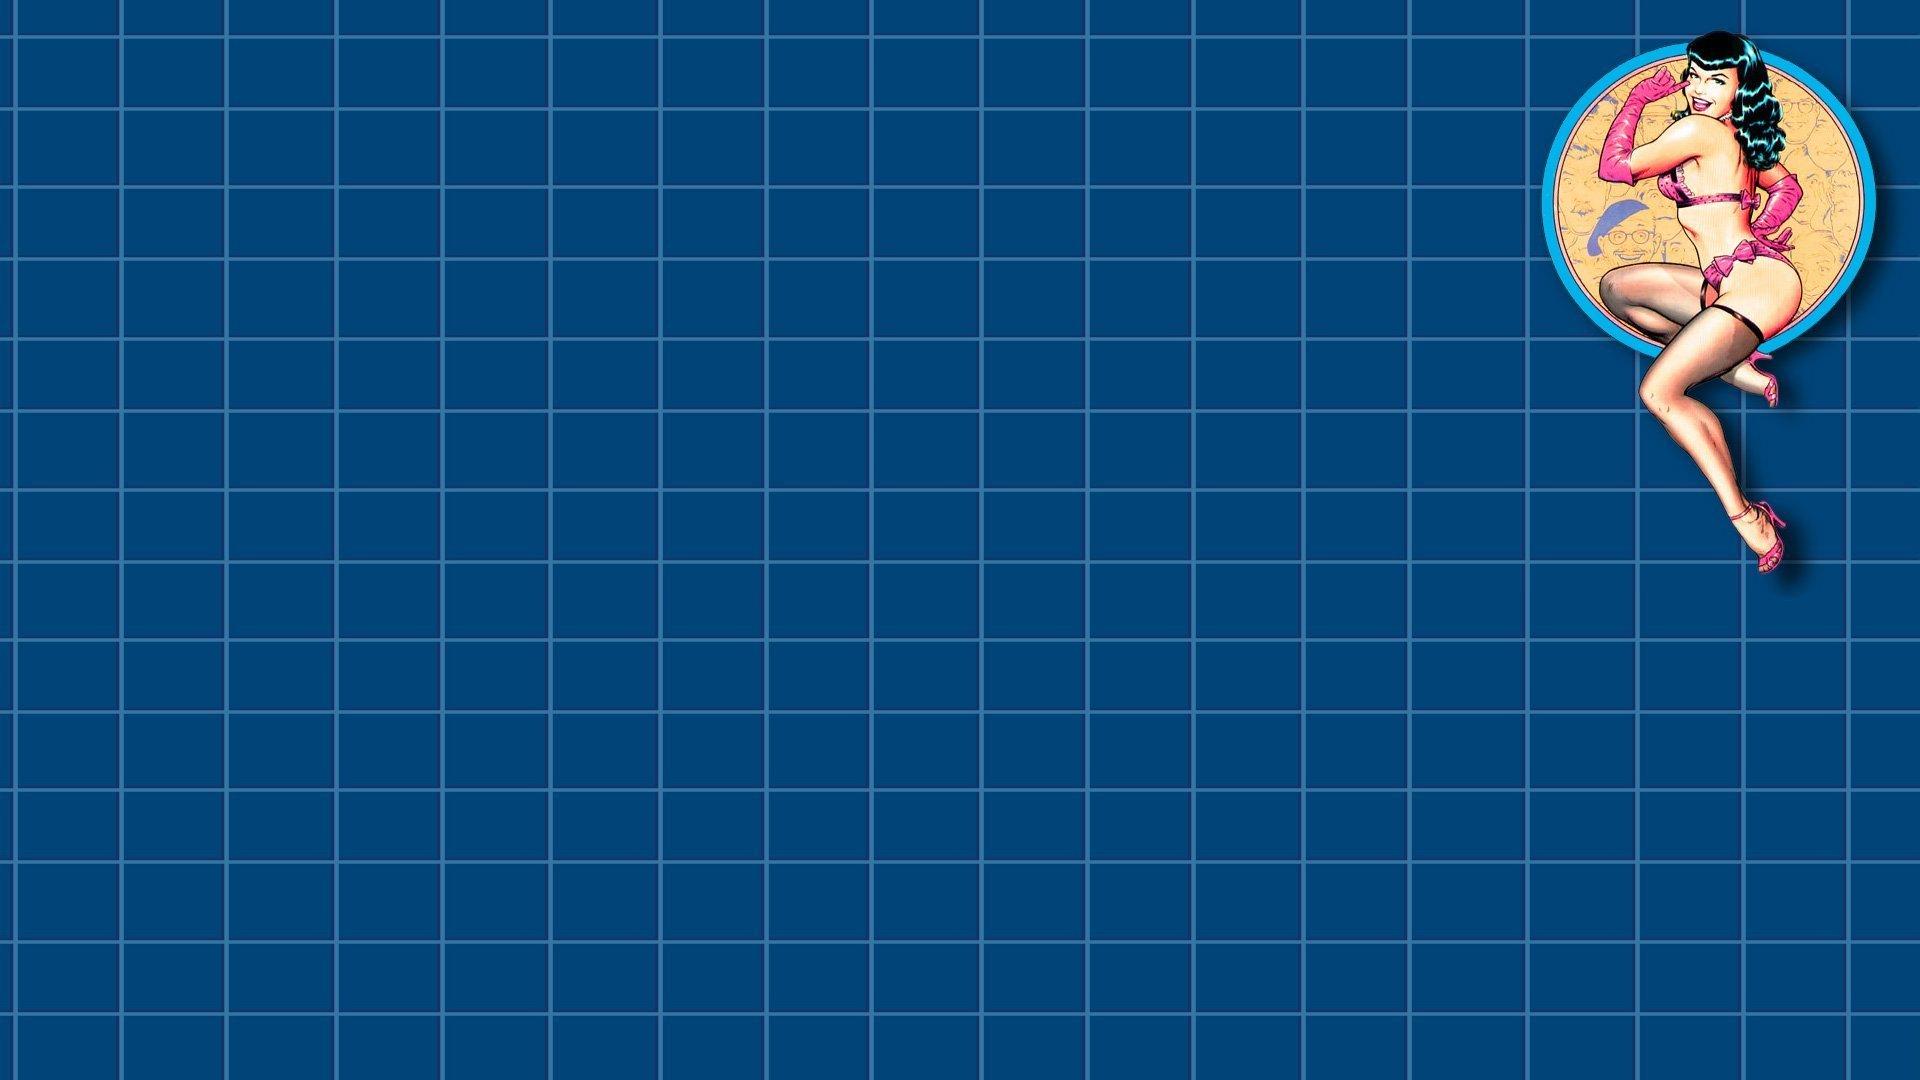 Pinup Wallpaper Free - WallpaperSafari